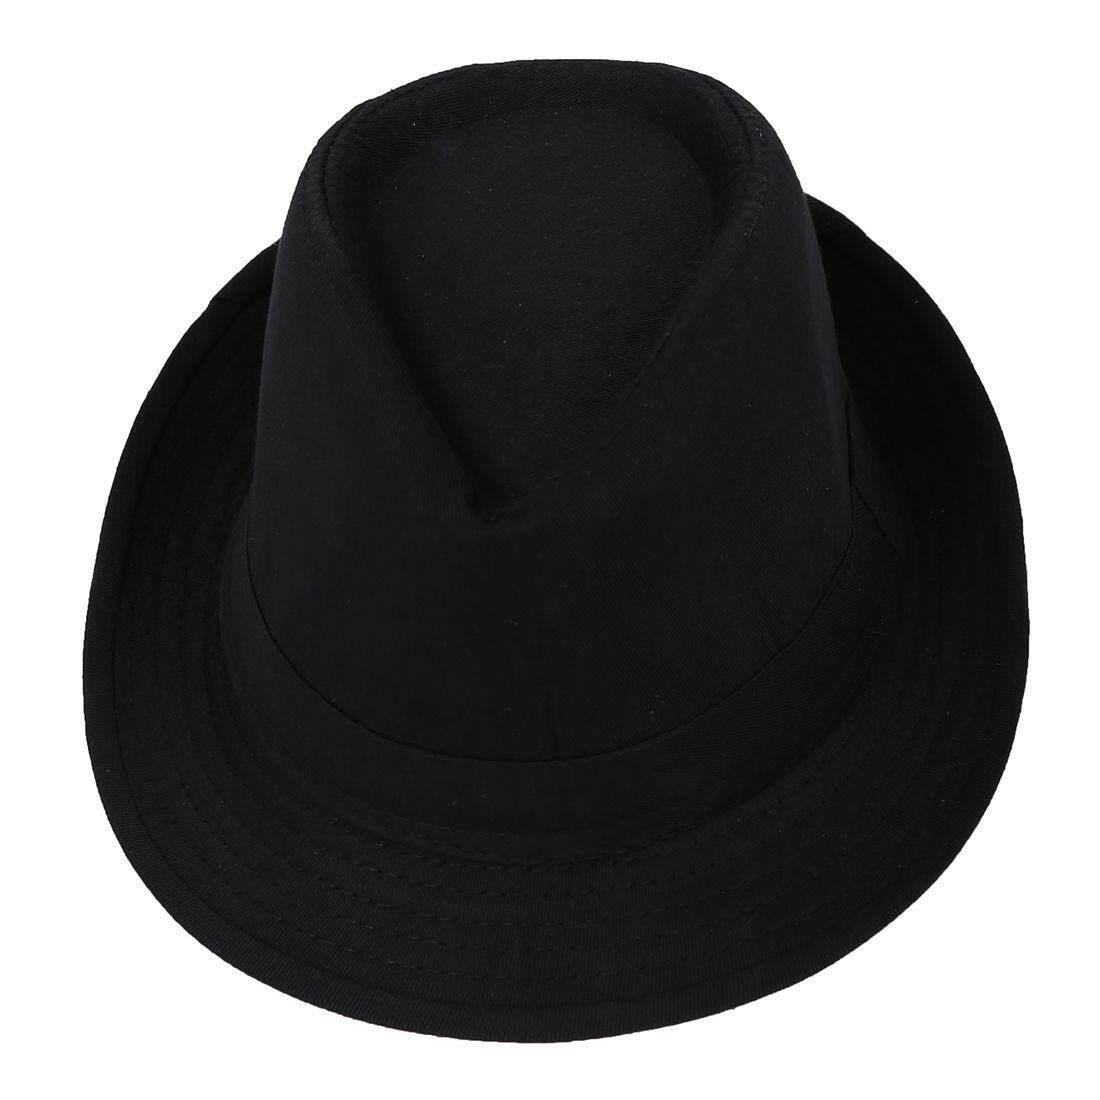 Fitur Hitam Fedora Topi Polos Pakaian Aksesori Untuk Gangster Fancy Houseofcuff Hat List Cream Dress Intl 3